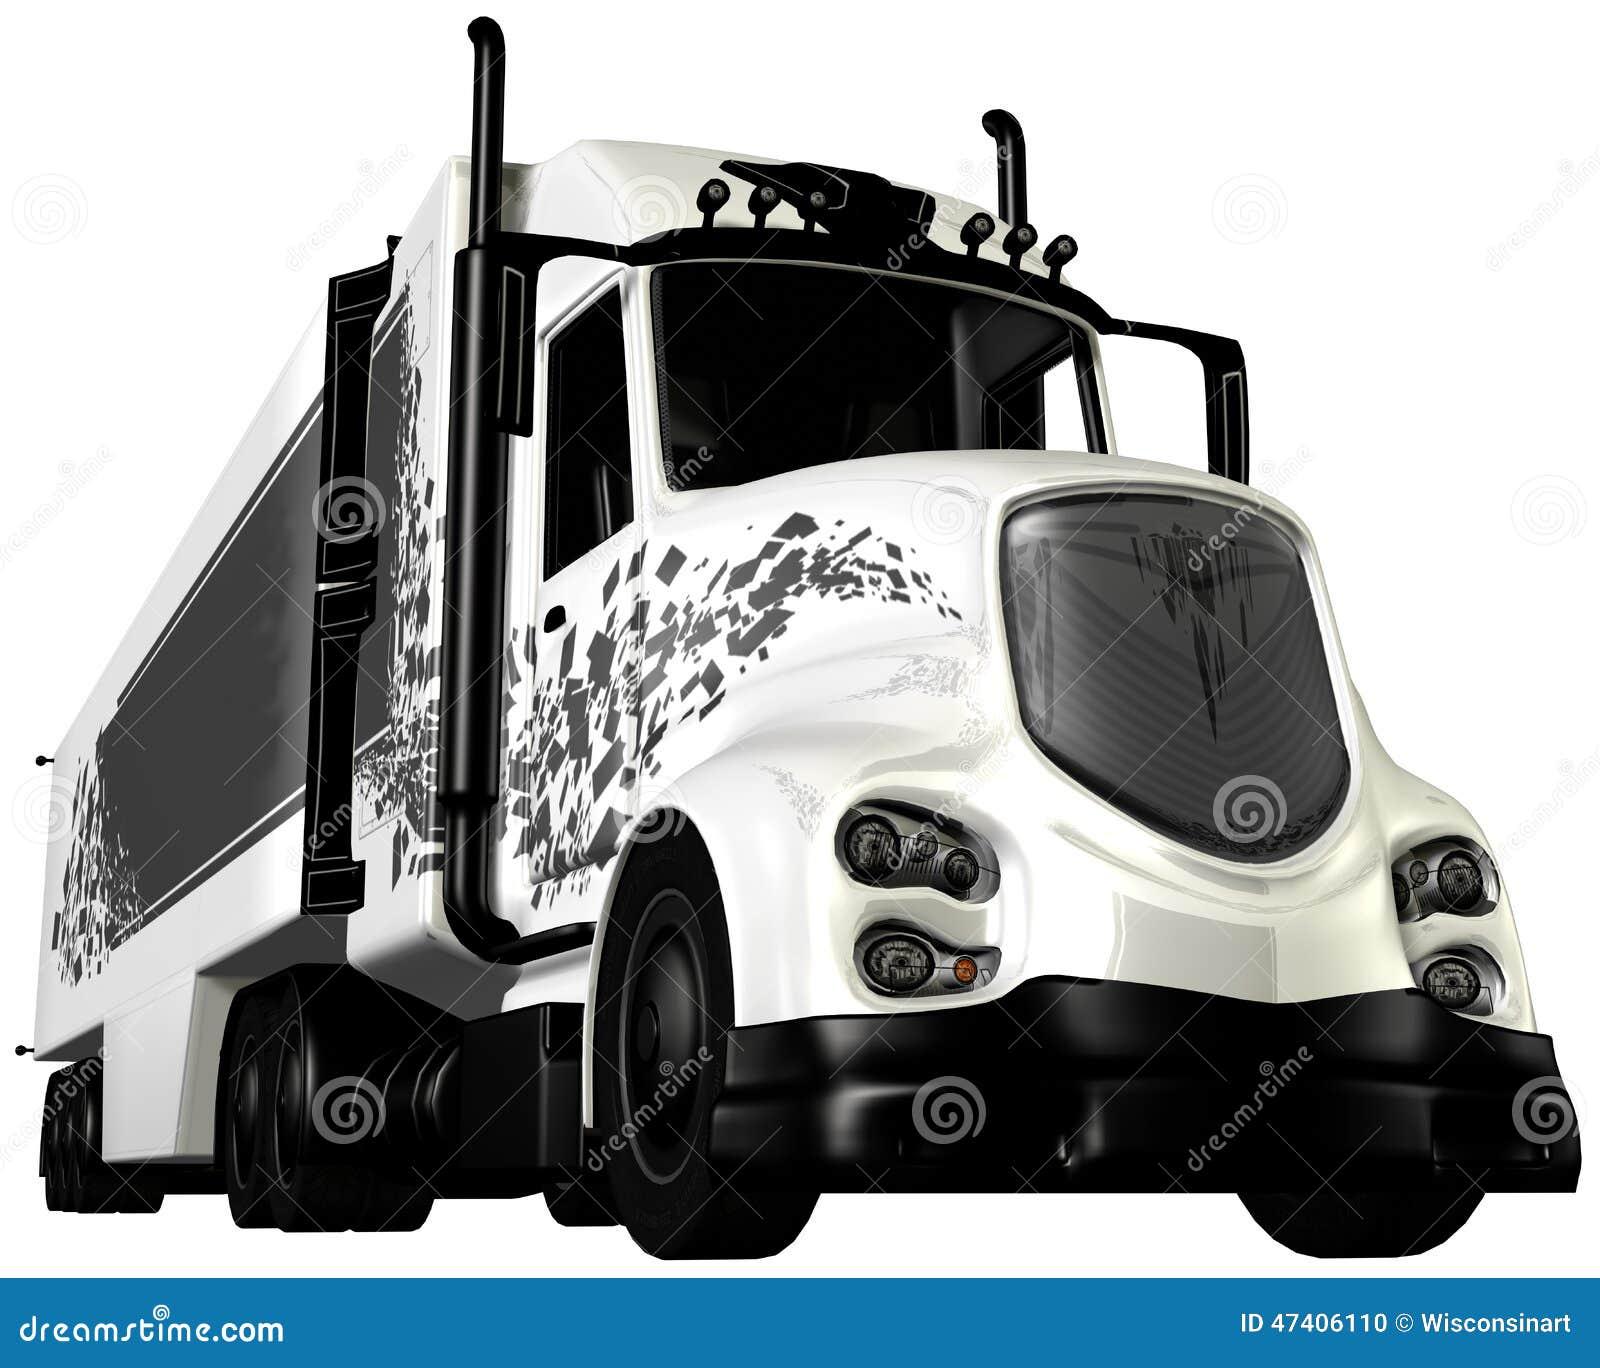 18 Wheeler Prices >> Tractor Trailer Cab 18 Wheeler Stock Illustration - Image: 47406110